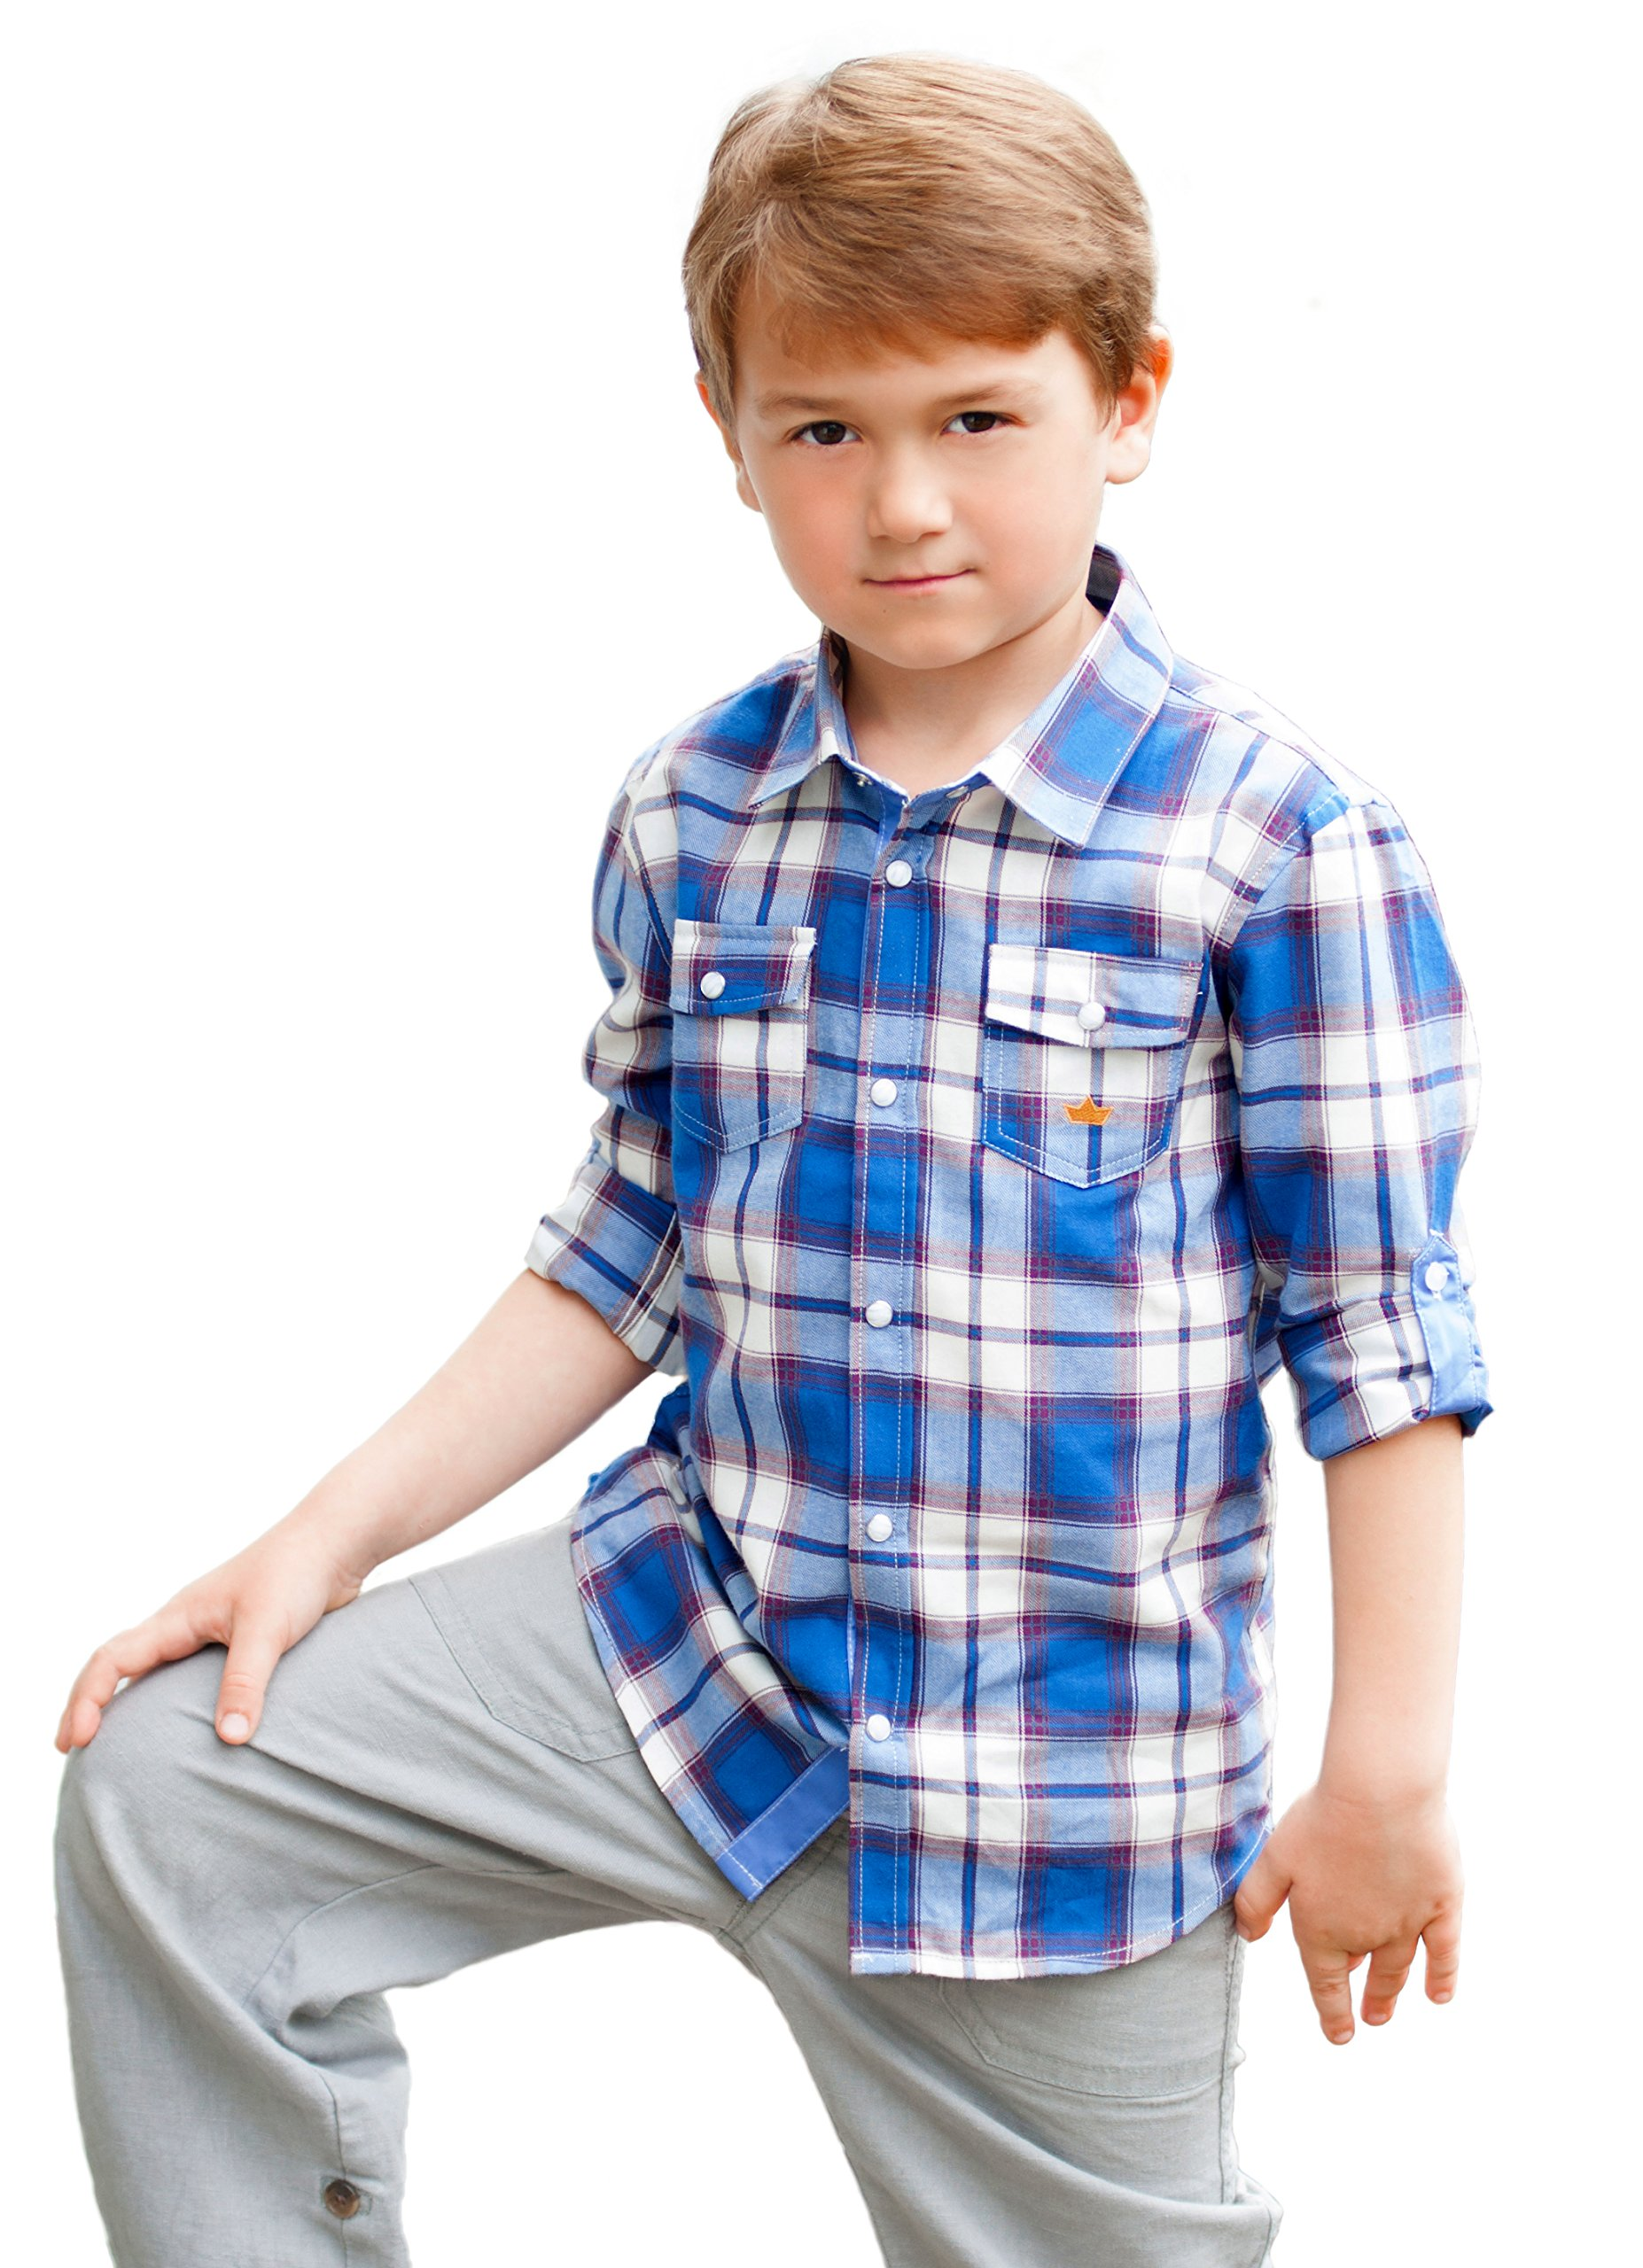 Dakomoda Toddler Boys' 100% Cotton Blue Western Plaid Shirt Roll up Sleeve Snap Shirt with Pockets 2T